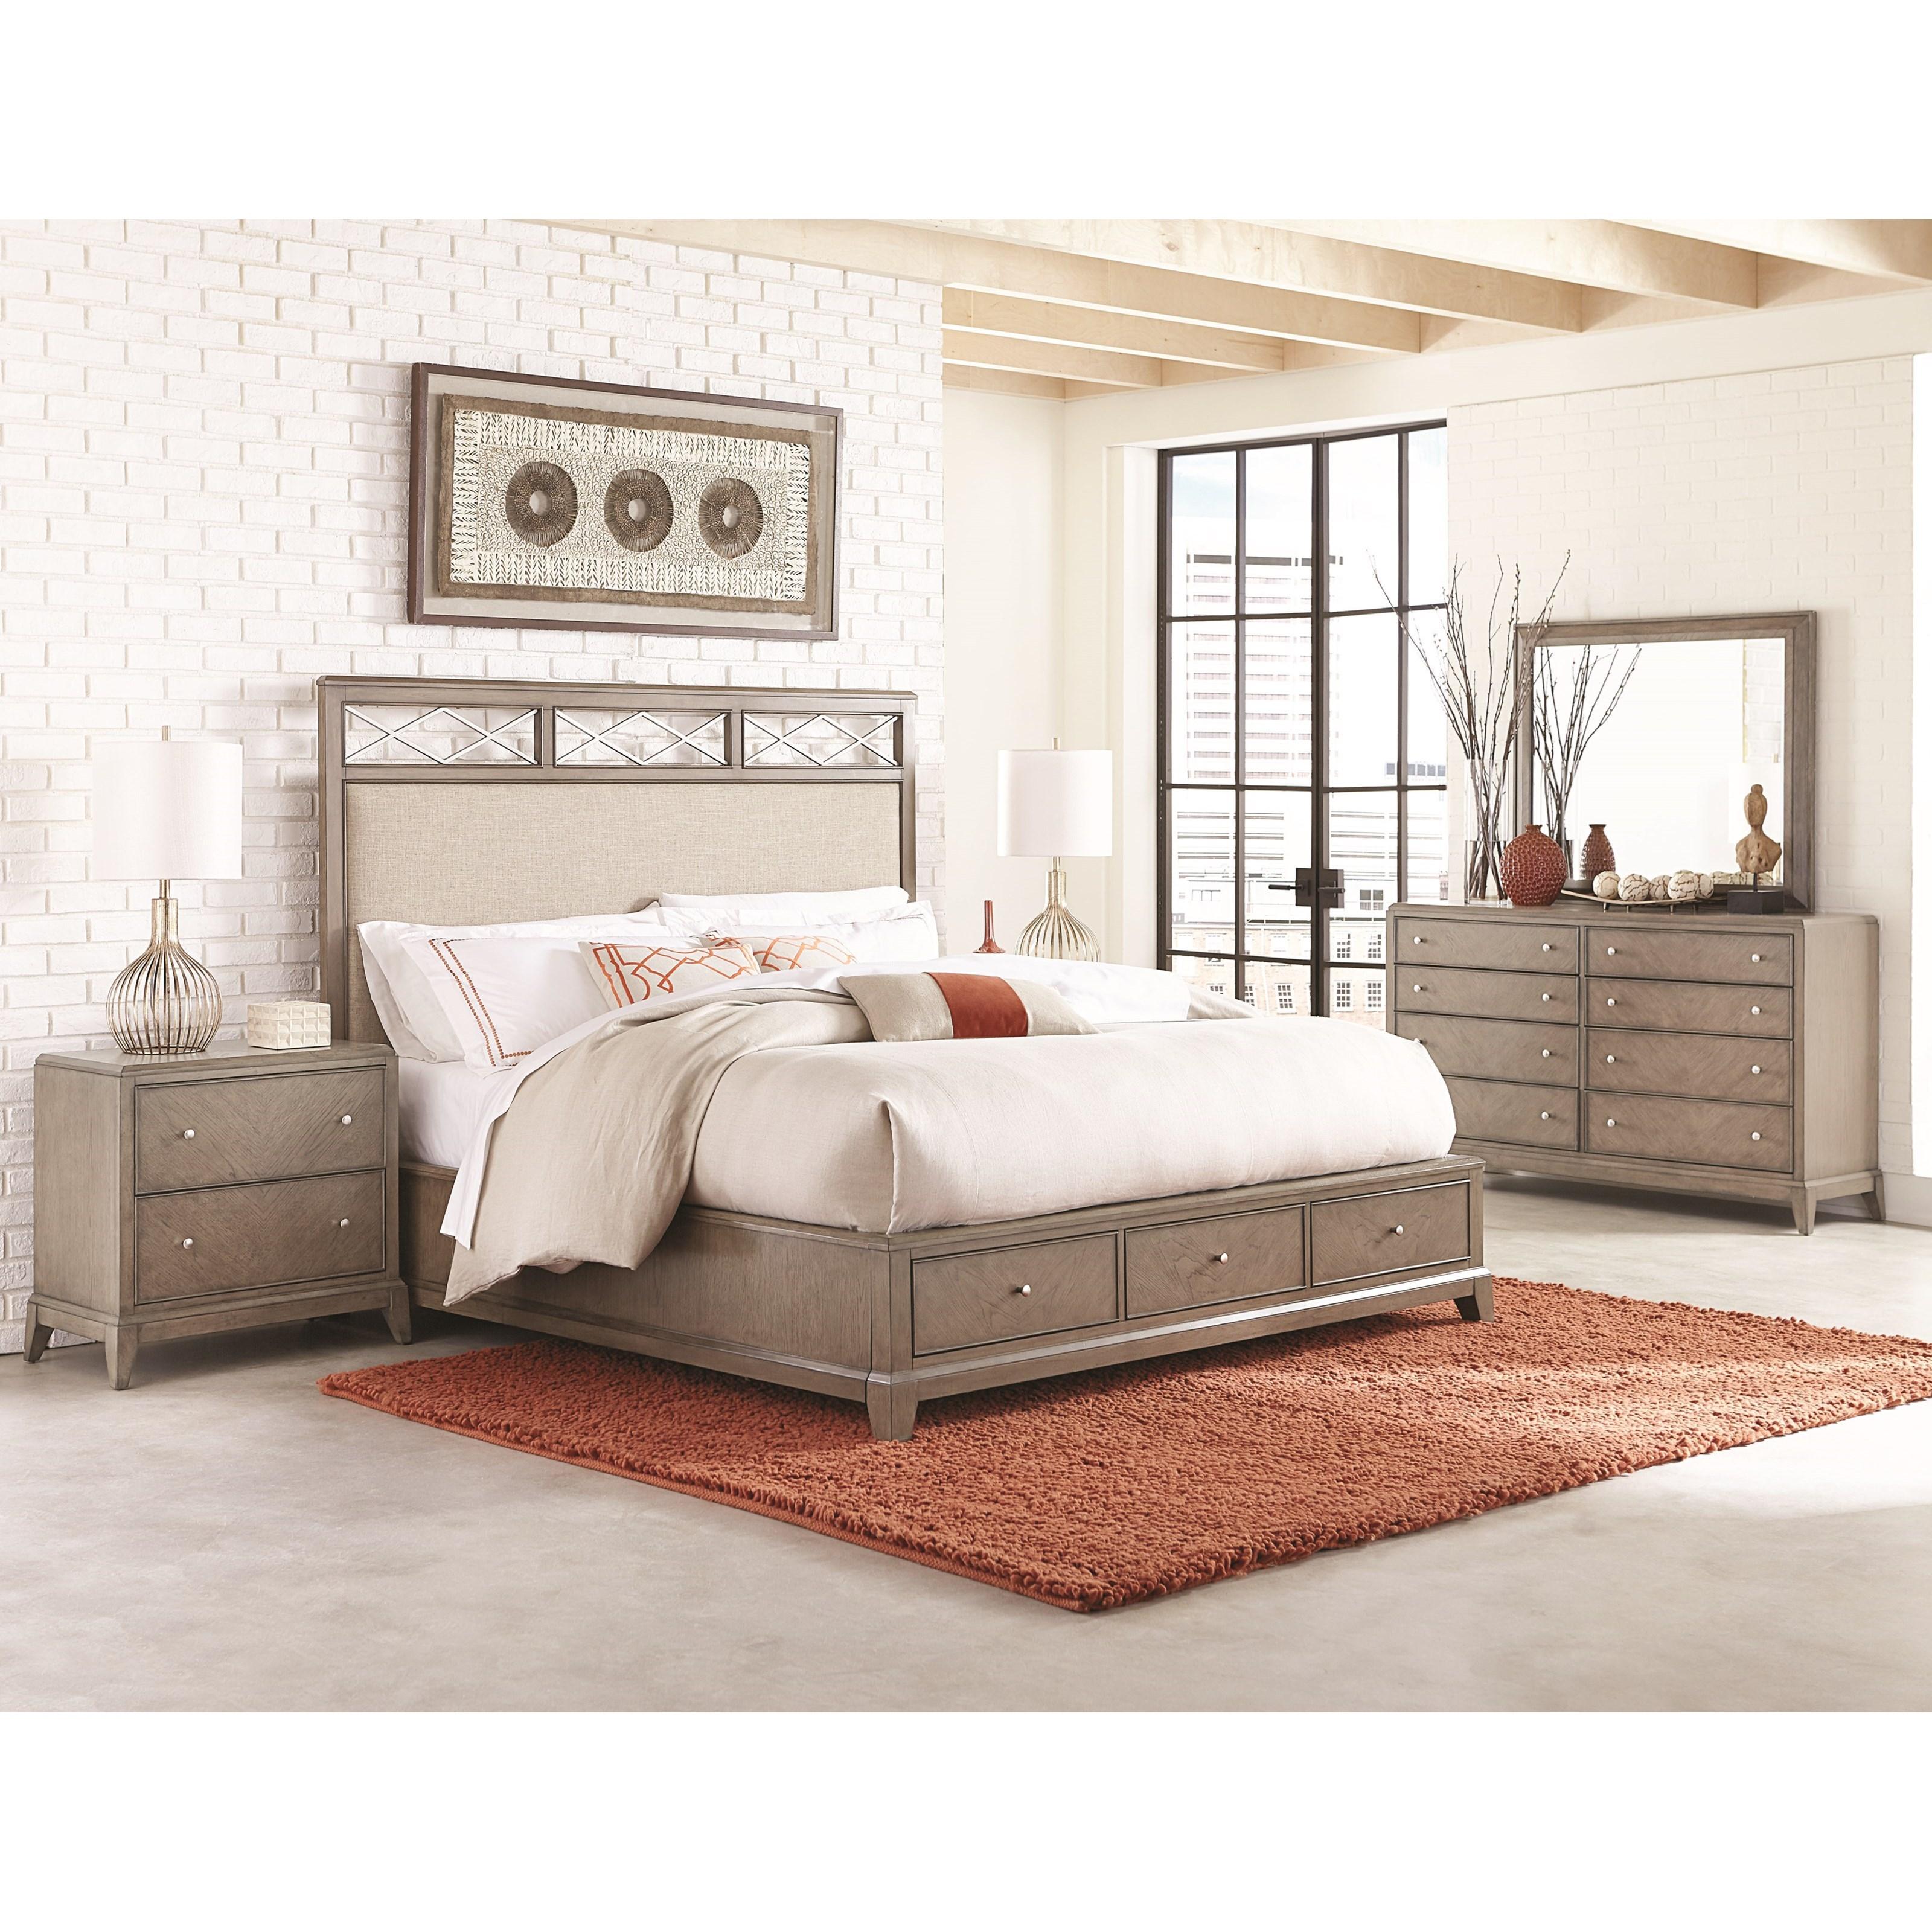 Legacy Classic Apex Queen Bedroom Group